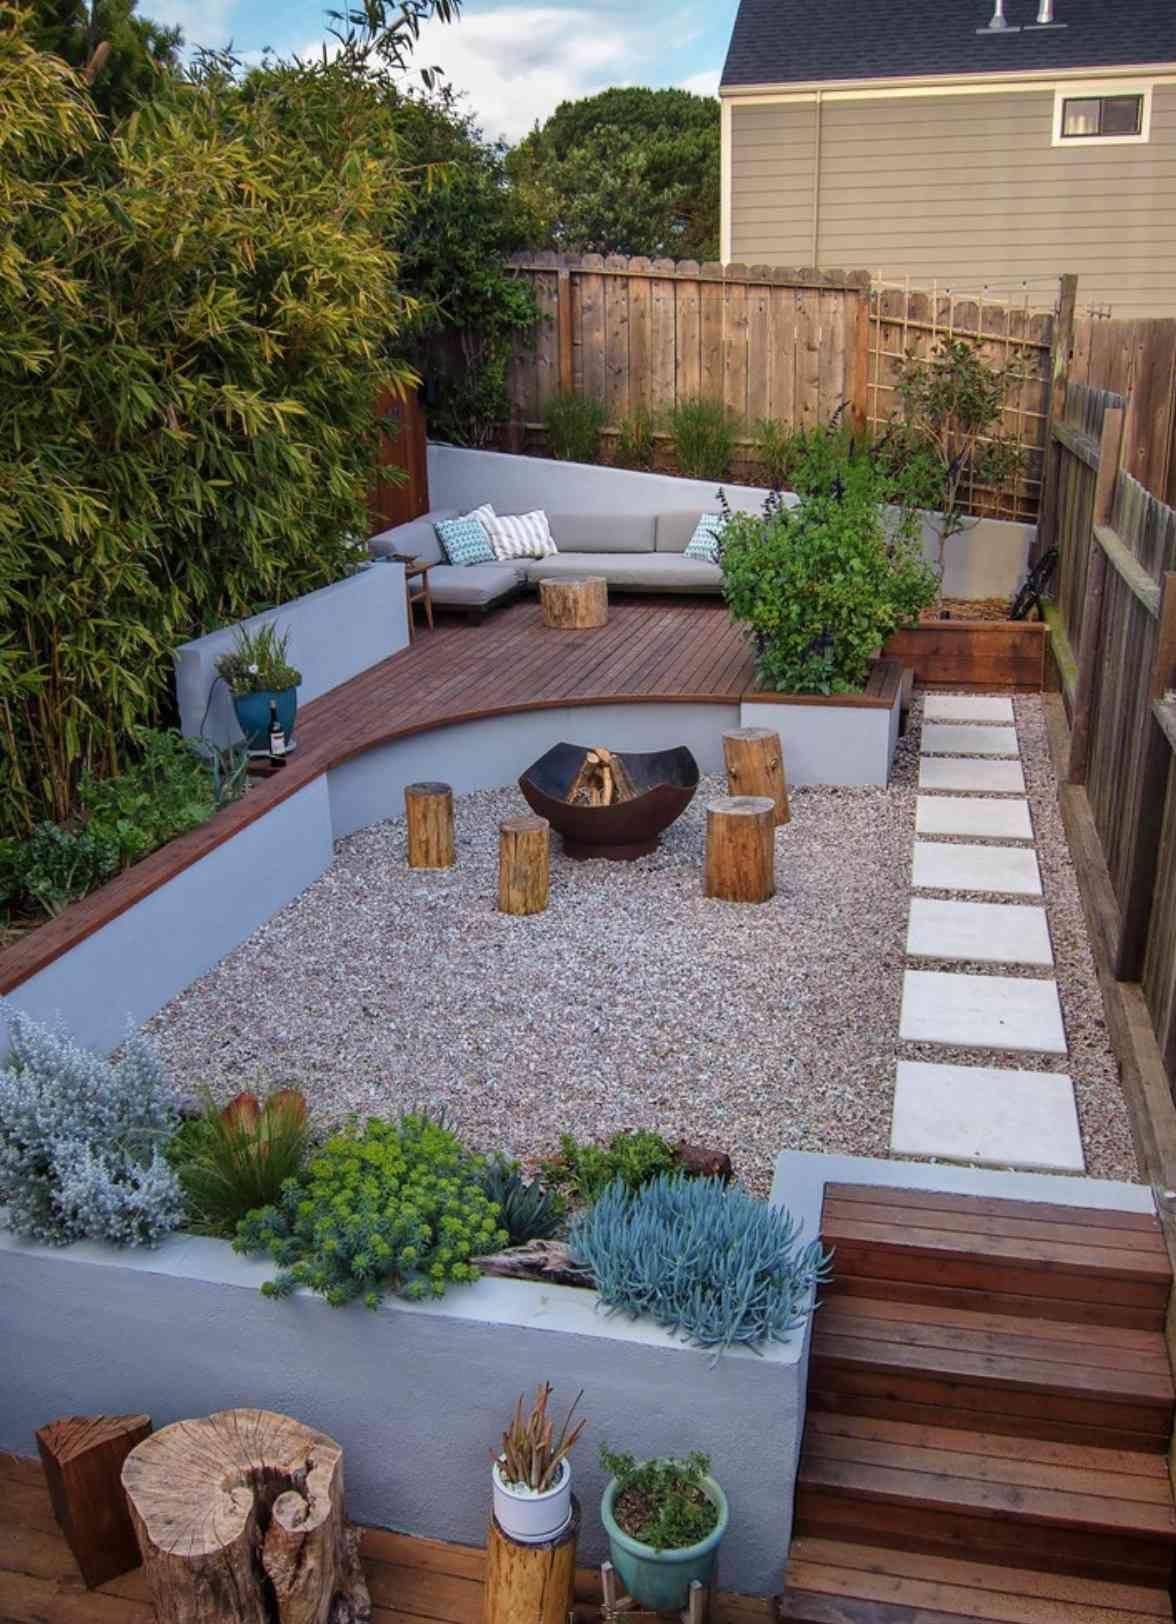 49 Great Backyard Landscaping Ideas In 2020 Backyard Remodel Sloped Backyard Small Backyard Gardens New house backyard ideas